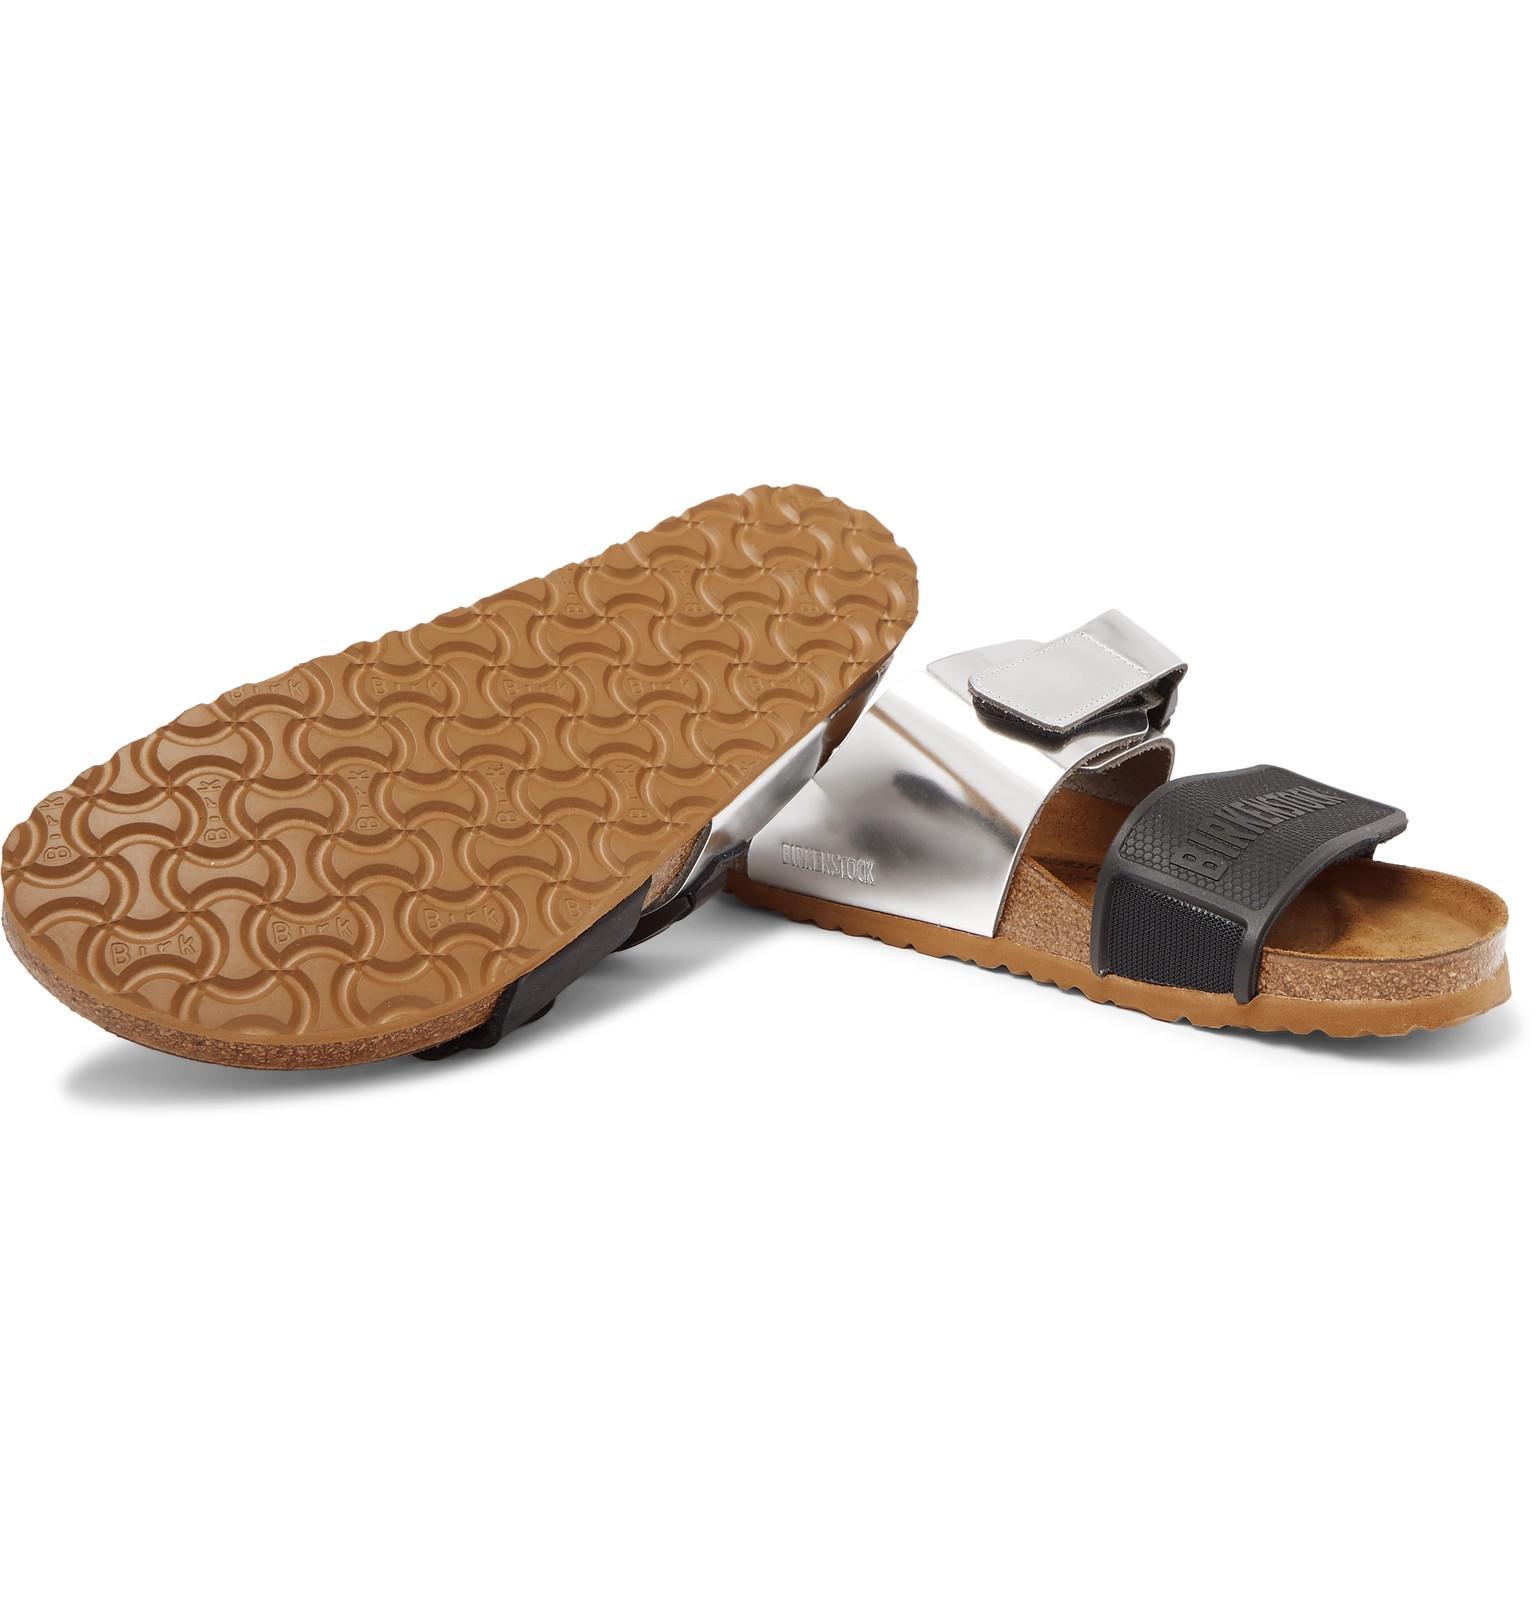 25b2ff831469 Rick Owens - + Birkenstock Rotterdam Metallic Leather And Rubber Sandals  for Men - Lyst. View fullscreen